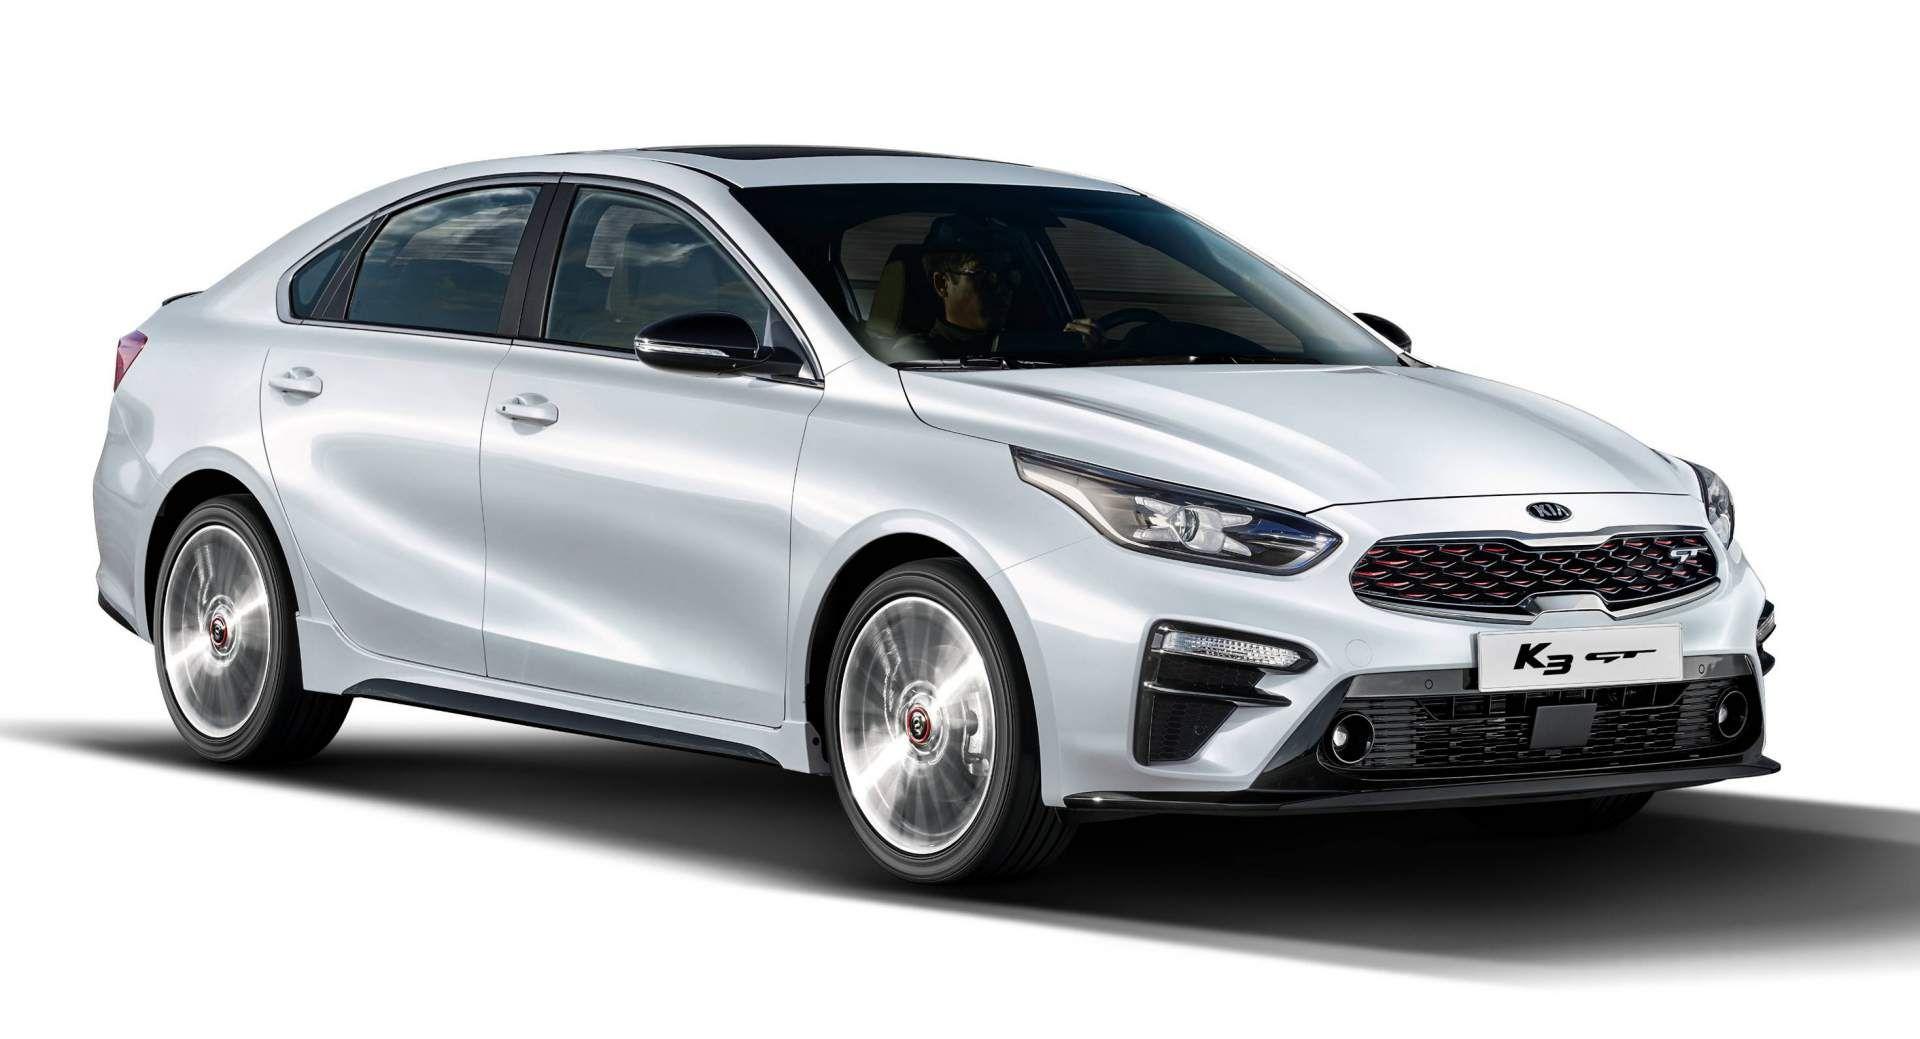 2019 Kia K3 Gt Sedan Previews America S Forte Gt Carscoops Kia Sedan Hyundai Cars